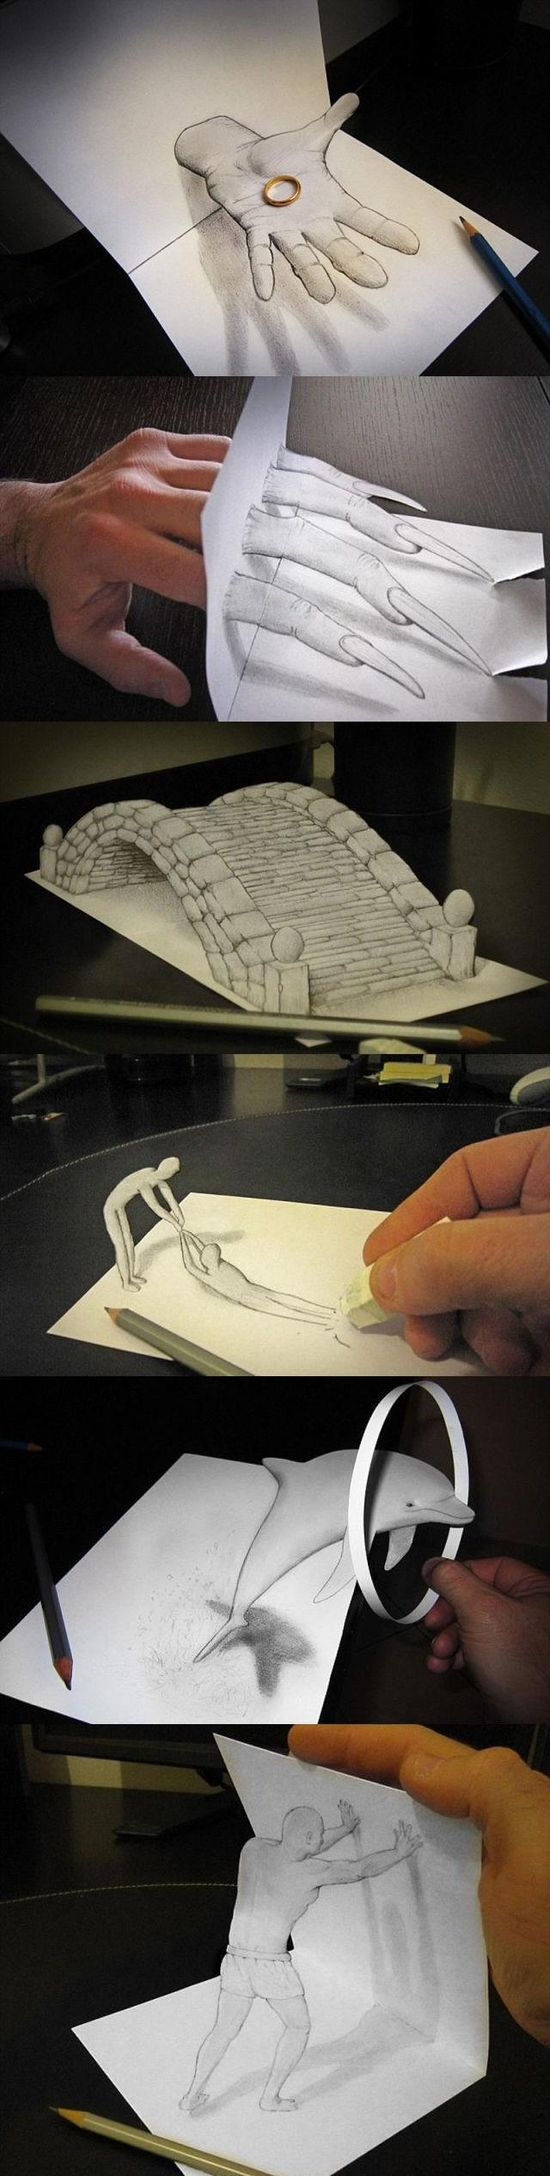 Amazing 3D arts